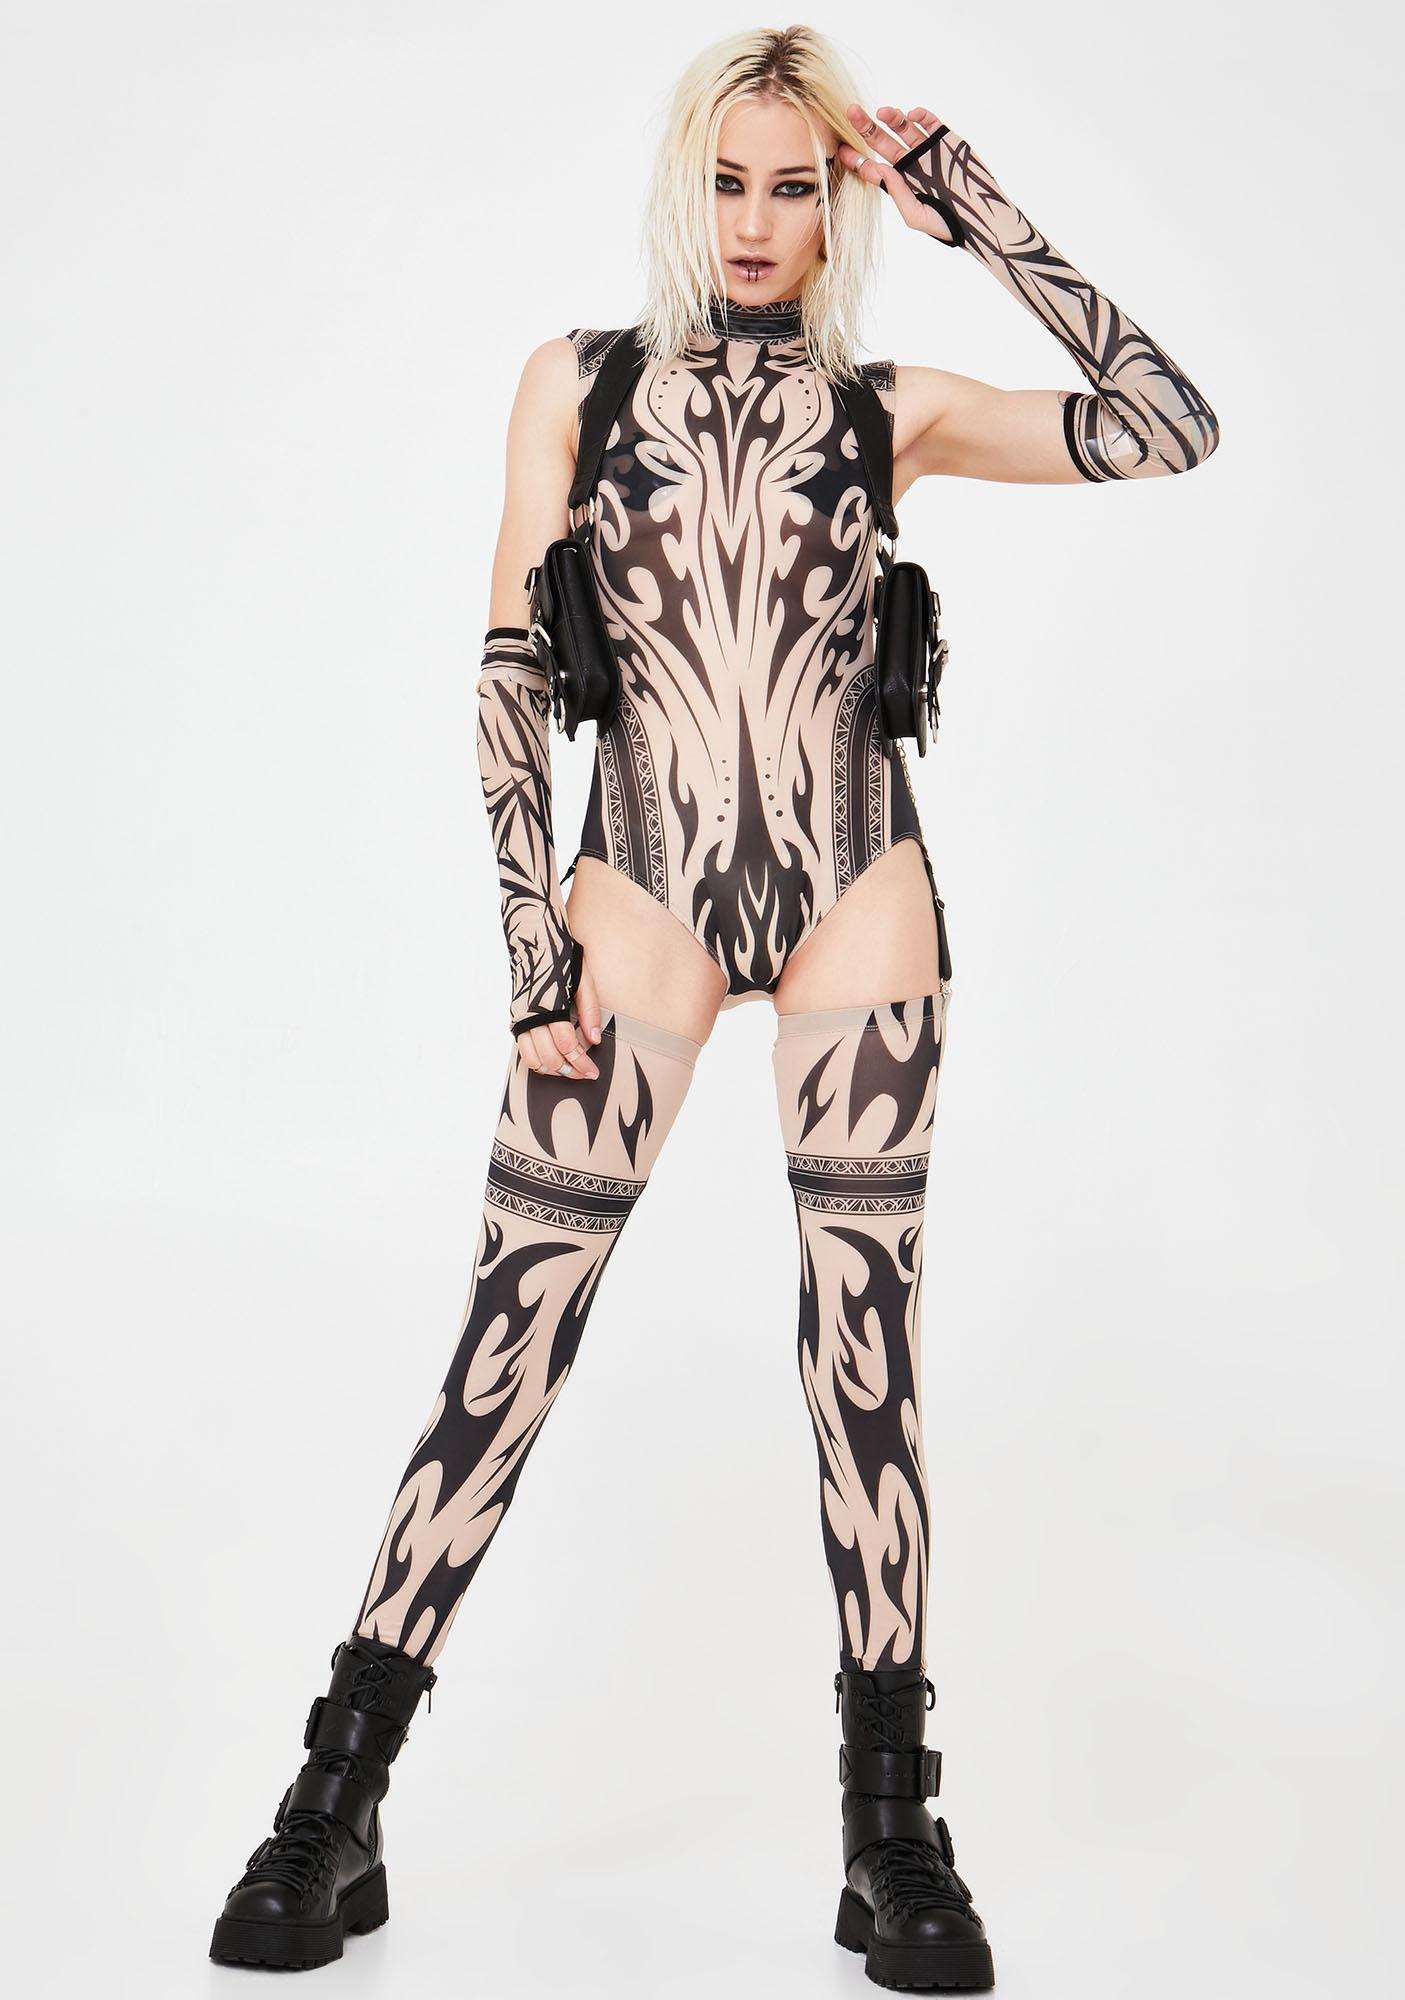 Club Exx Sharpshooter Mesh Bodysuit